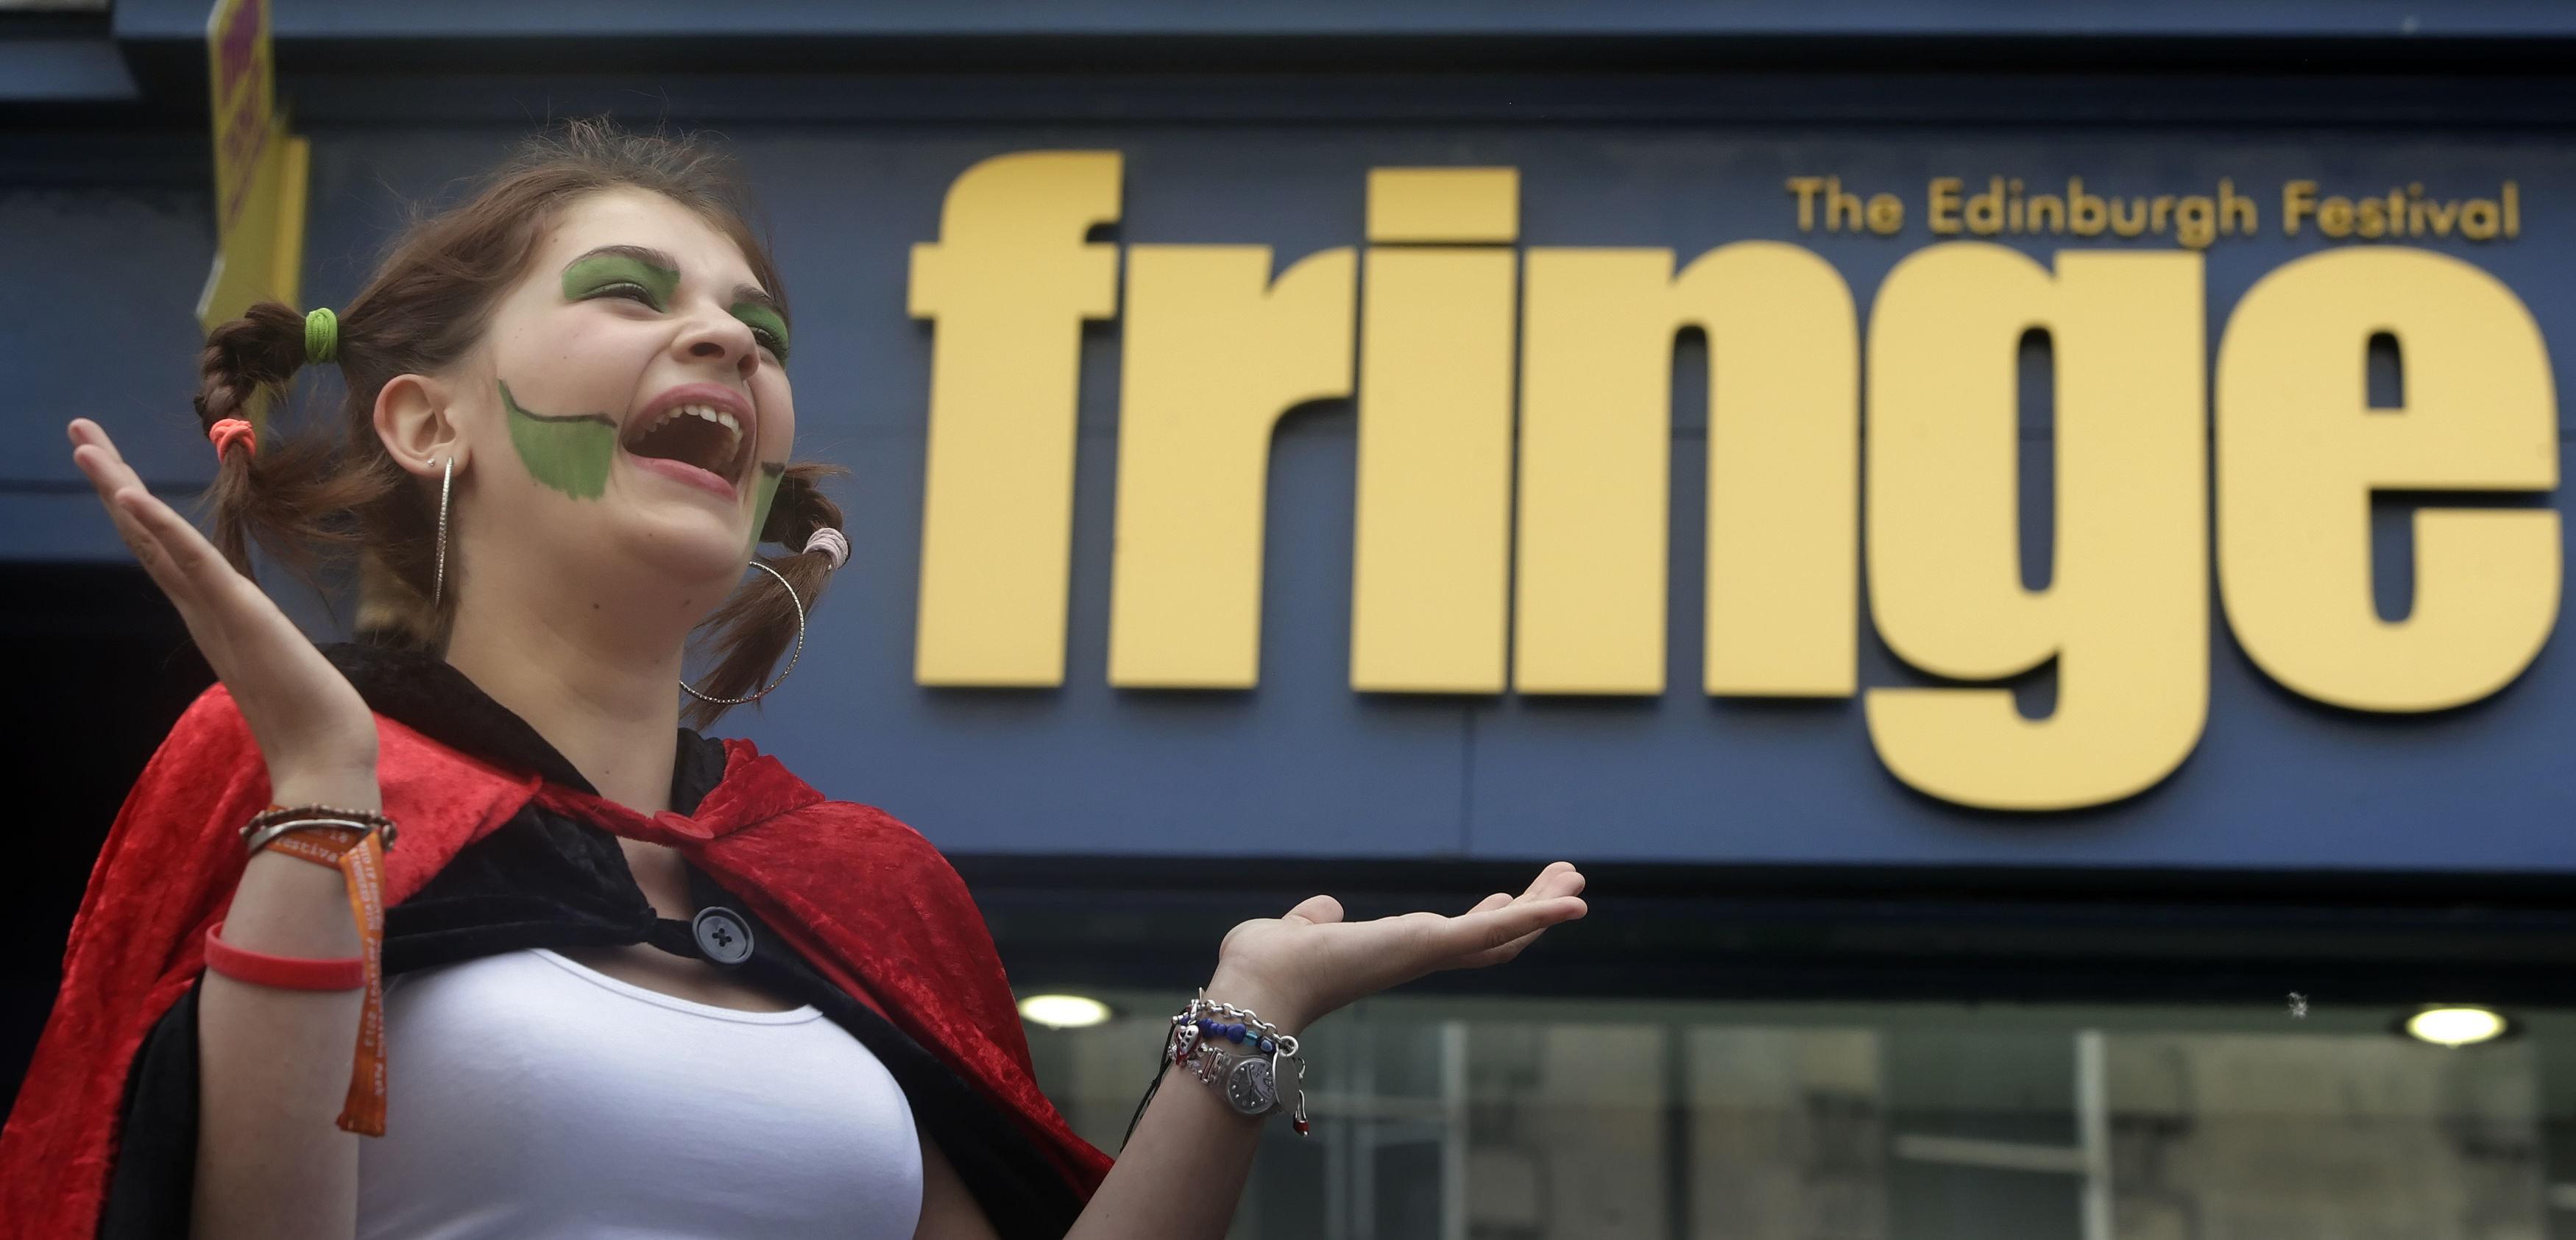 Top Edinburgh Fringe Comedians Showcase The Festival's Best